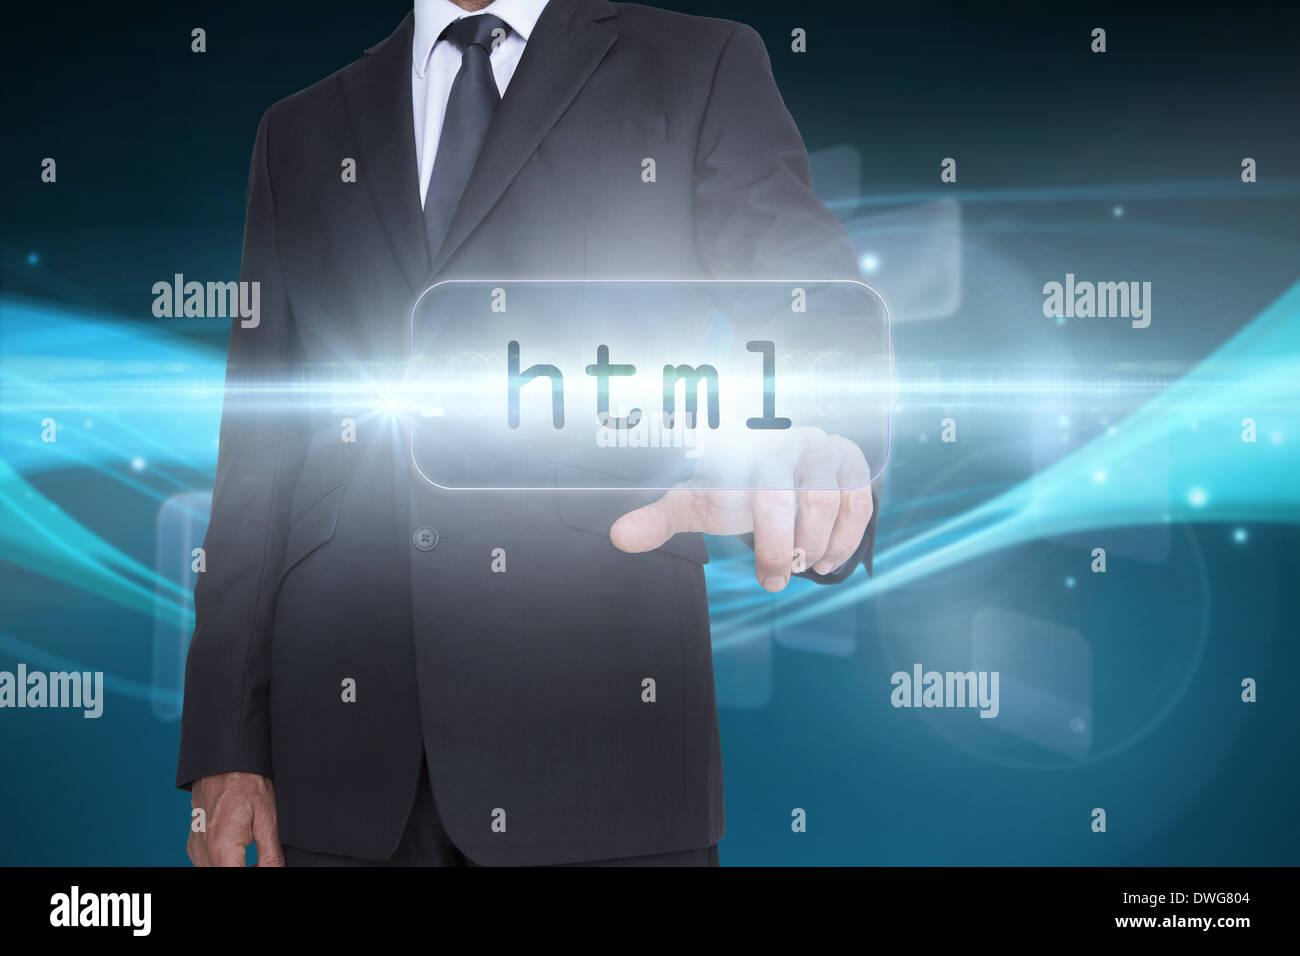 Html Stockfotos & Html Bilder - Alamy